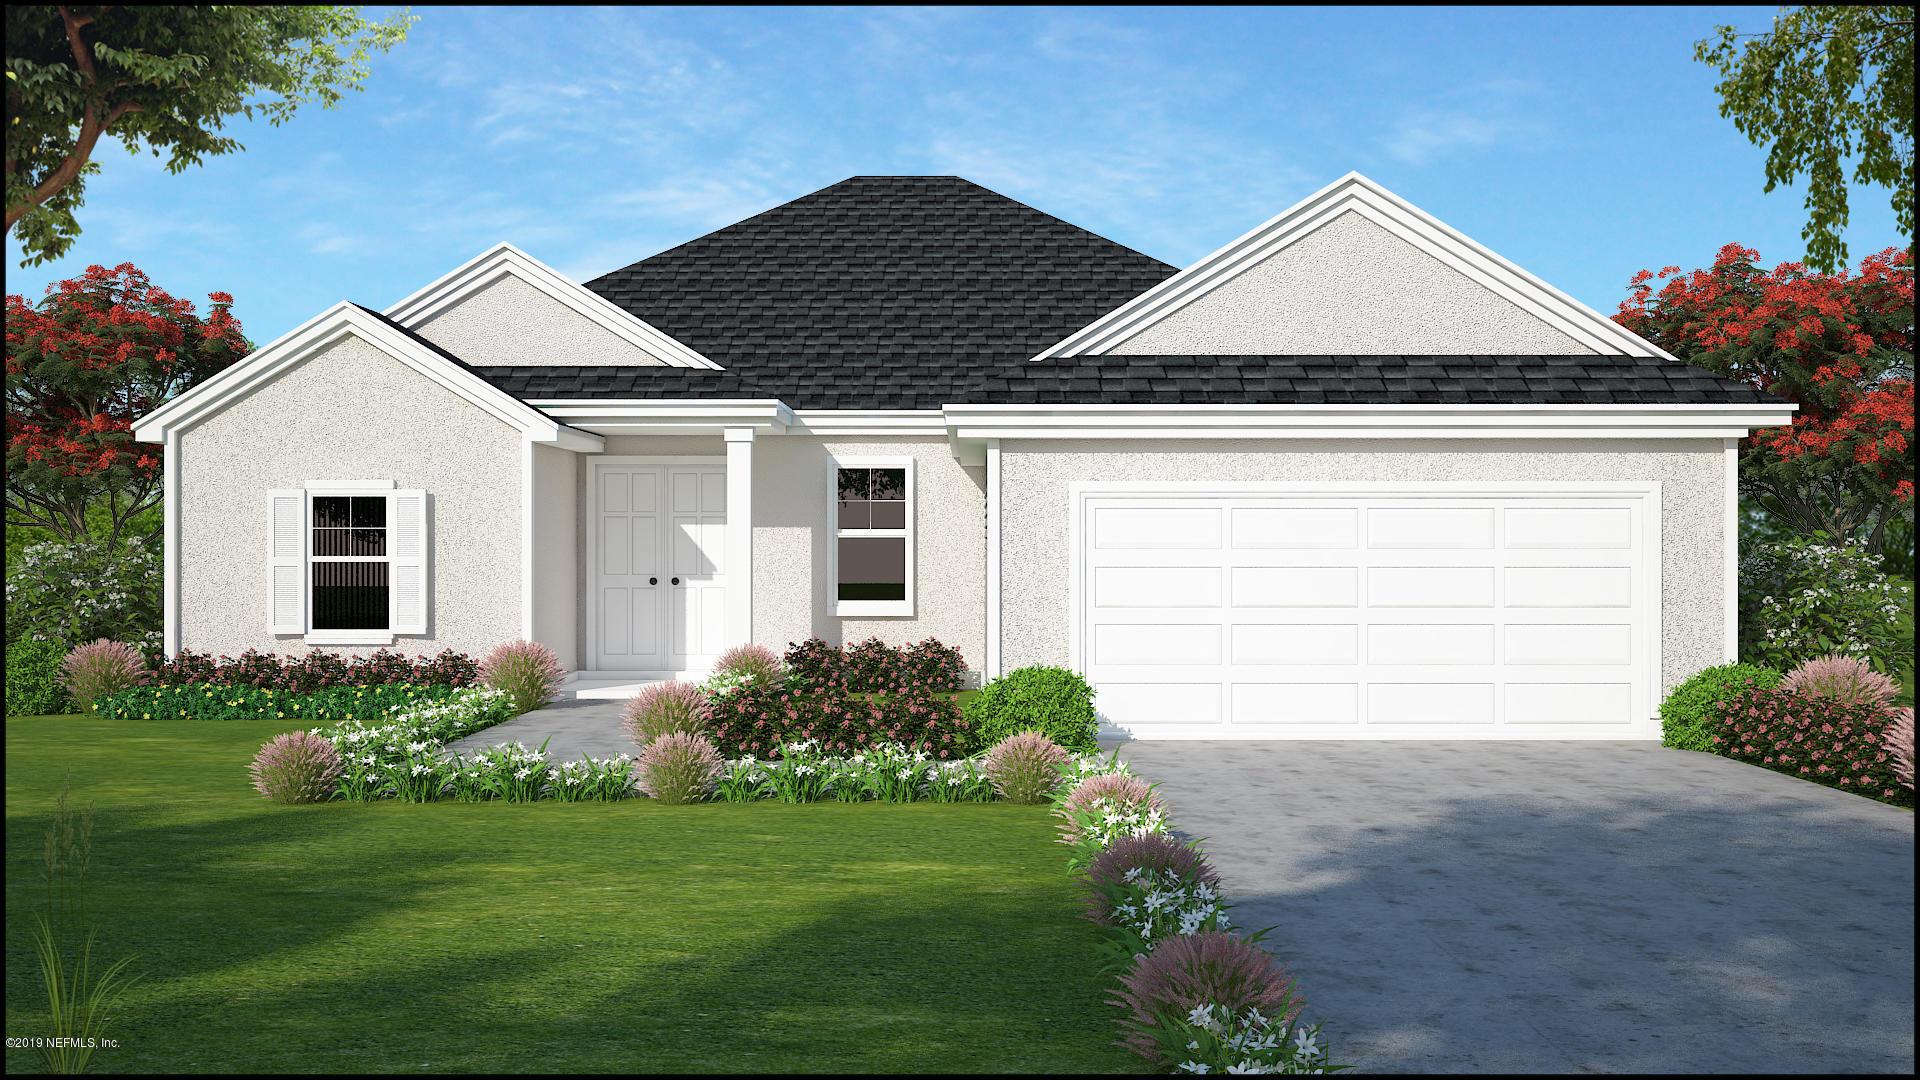 0 OAK BAY, JACKSONVILLE, FLORIDA 32277, 3 Bedrooms Bedrooms, ,2 BathroomsBathrooms,Residential,For sale,OAK BAY,1011189